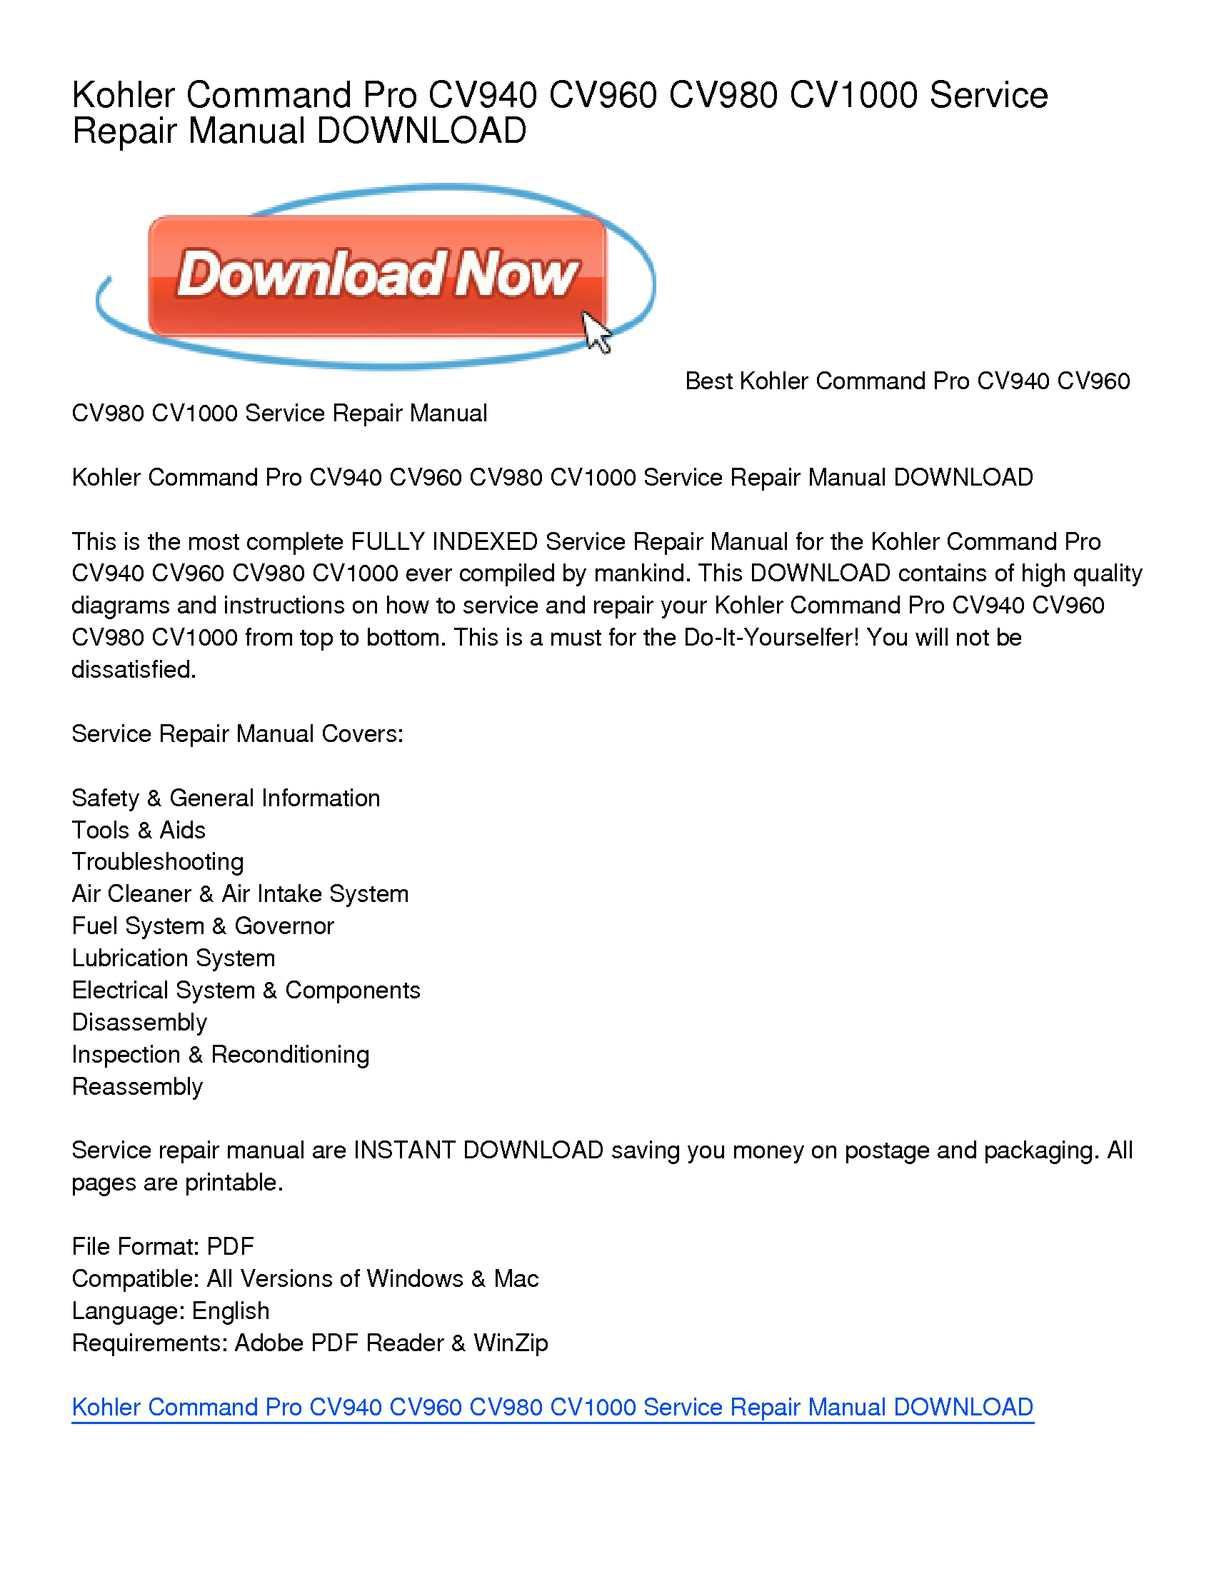 ... manual pdf elzplorers de Array - calam o kohler command pro cv940 cv960  cv980 cv1000 service repair rh calameo com